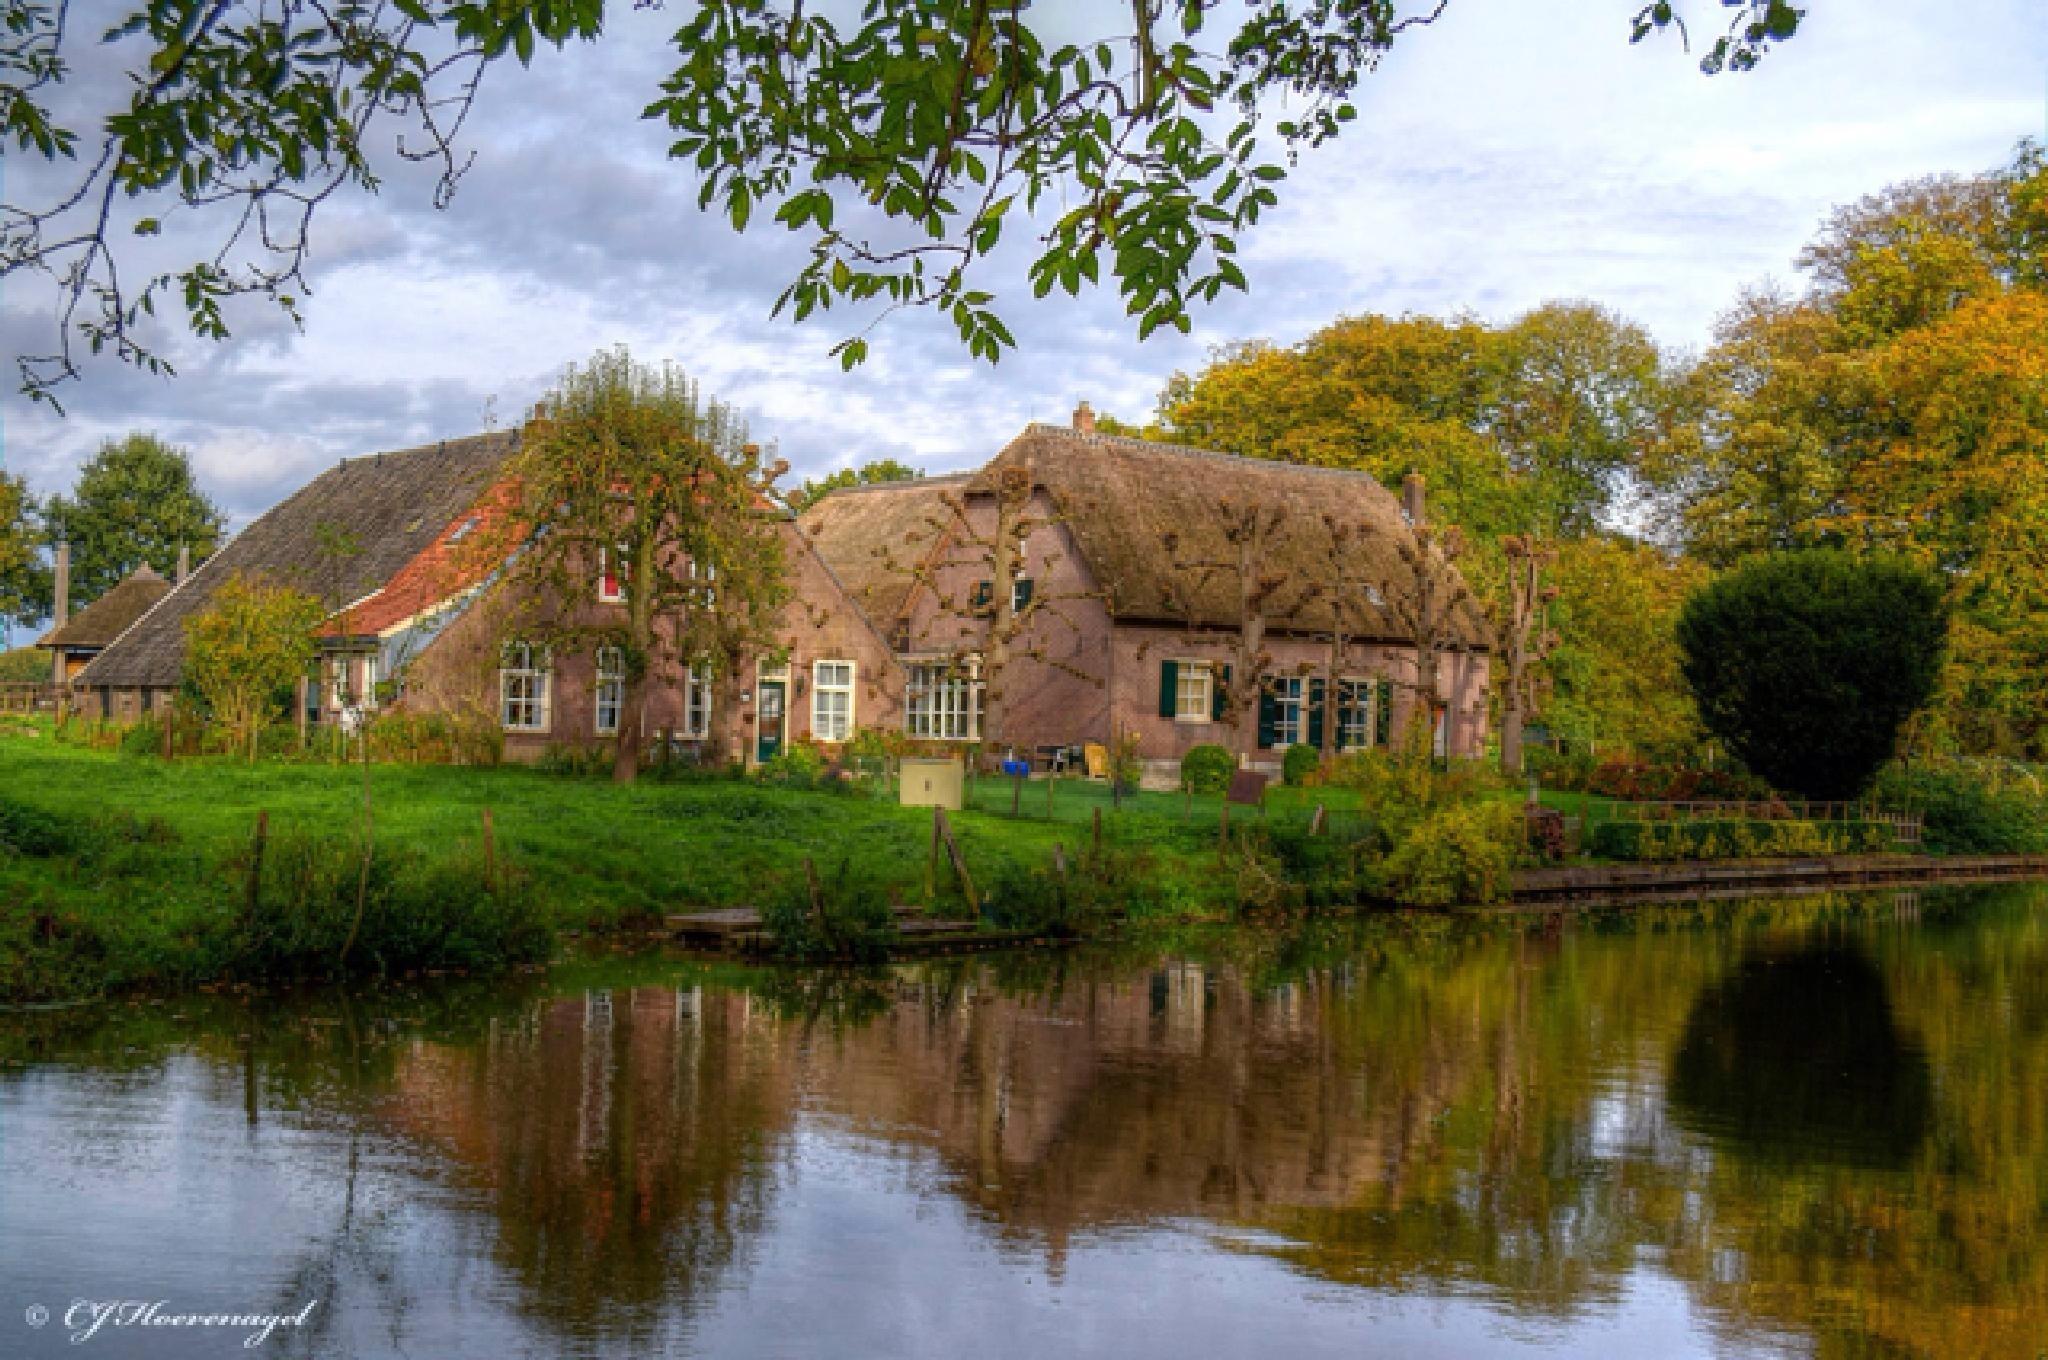 Holland by Cassy Hoevenagel